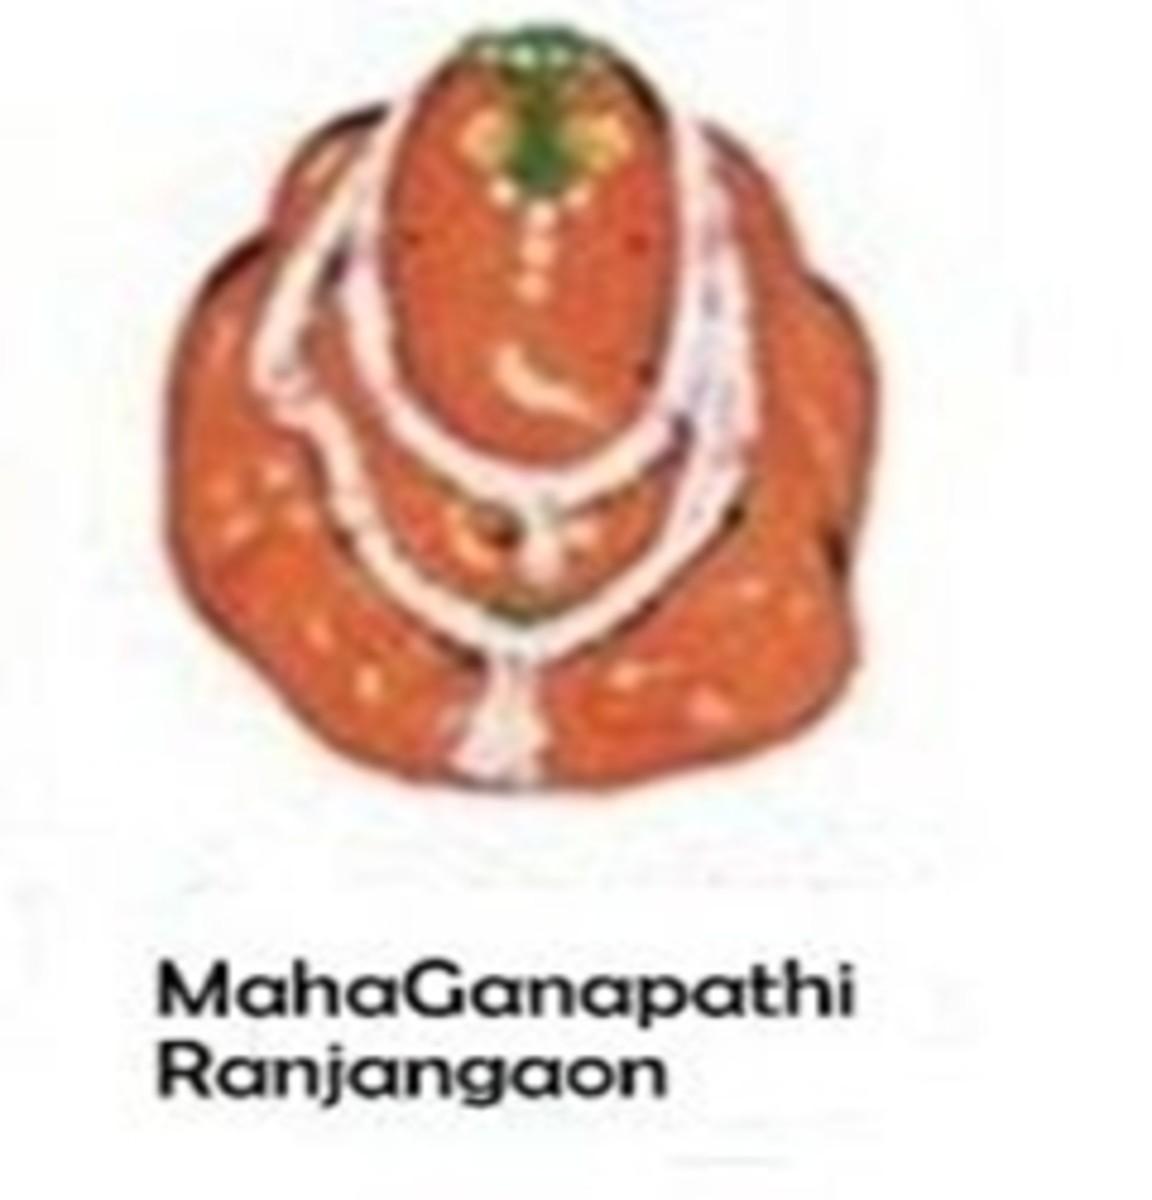 Shri Mahaganapati Templo, Ranjangaon